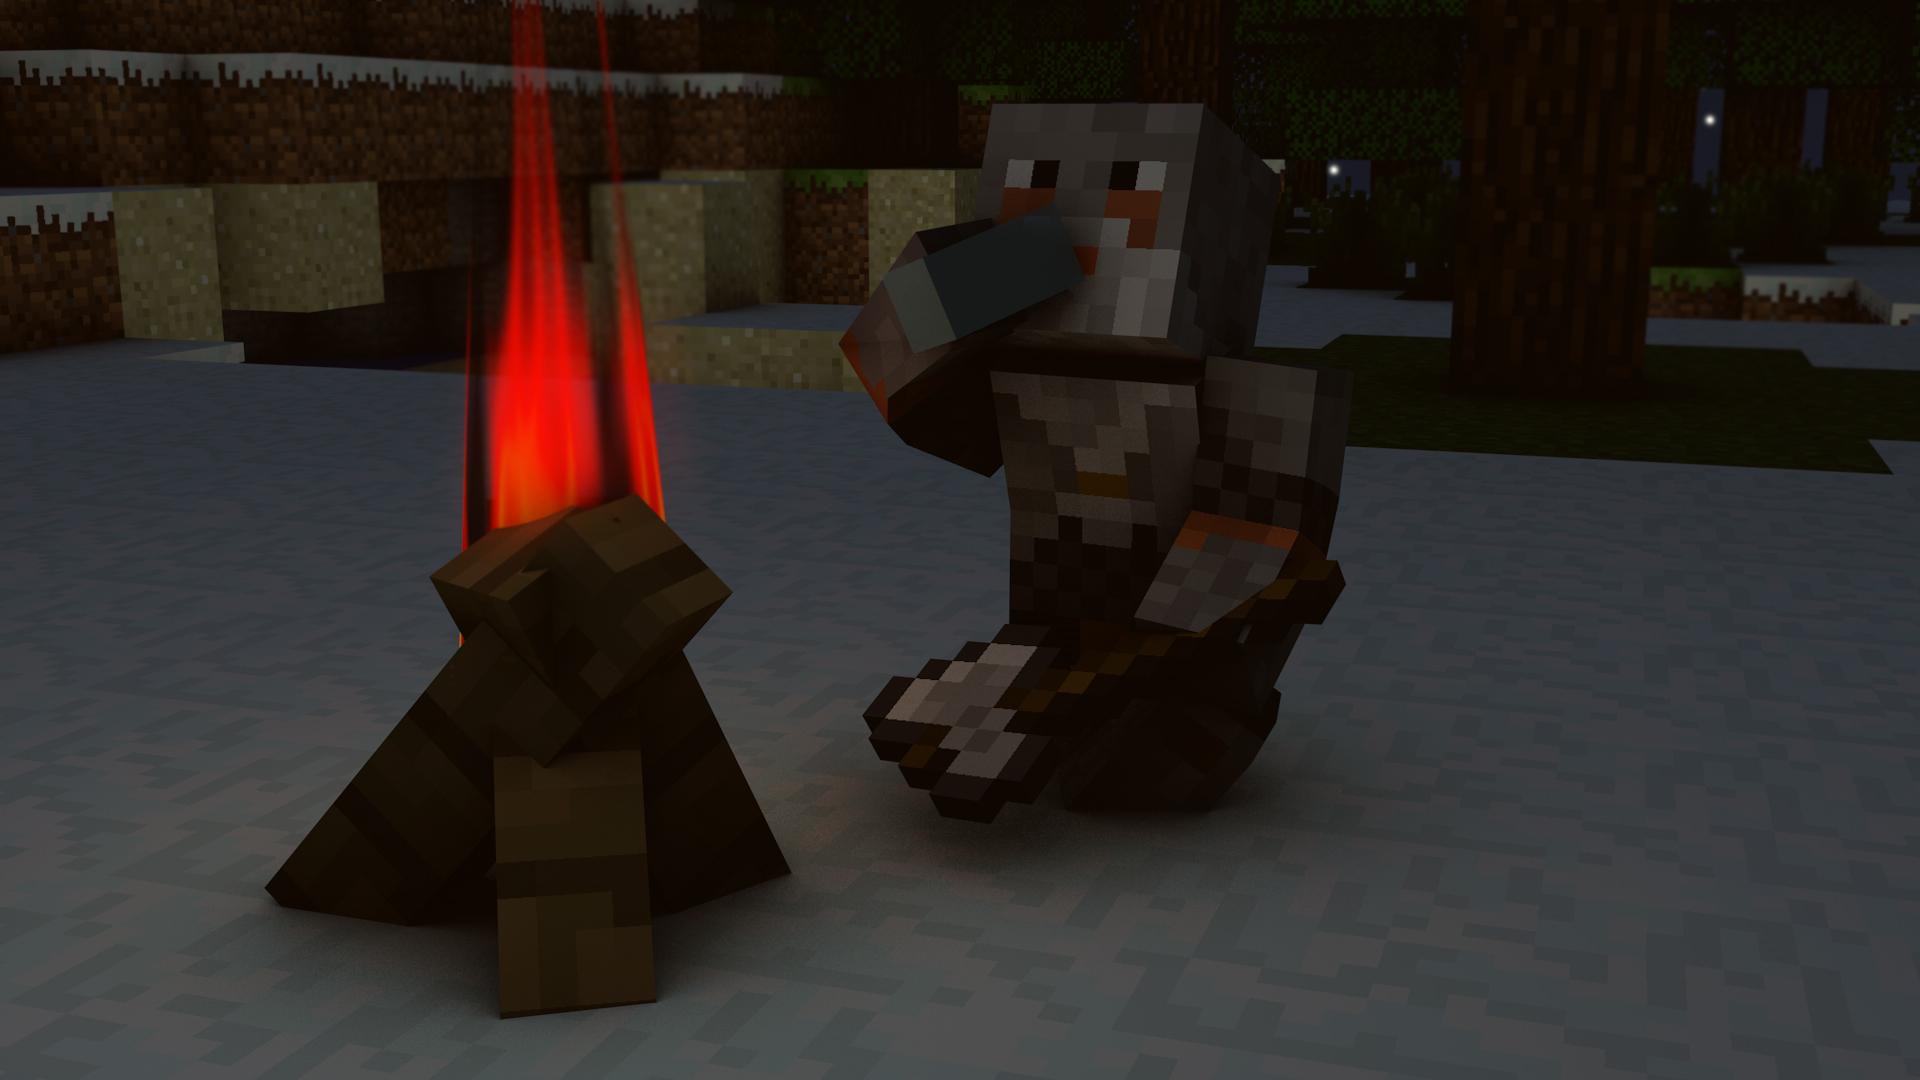 rozbitek przy ognisku